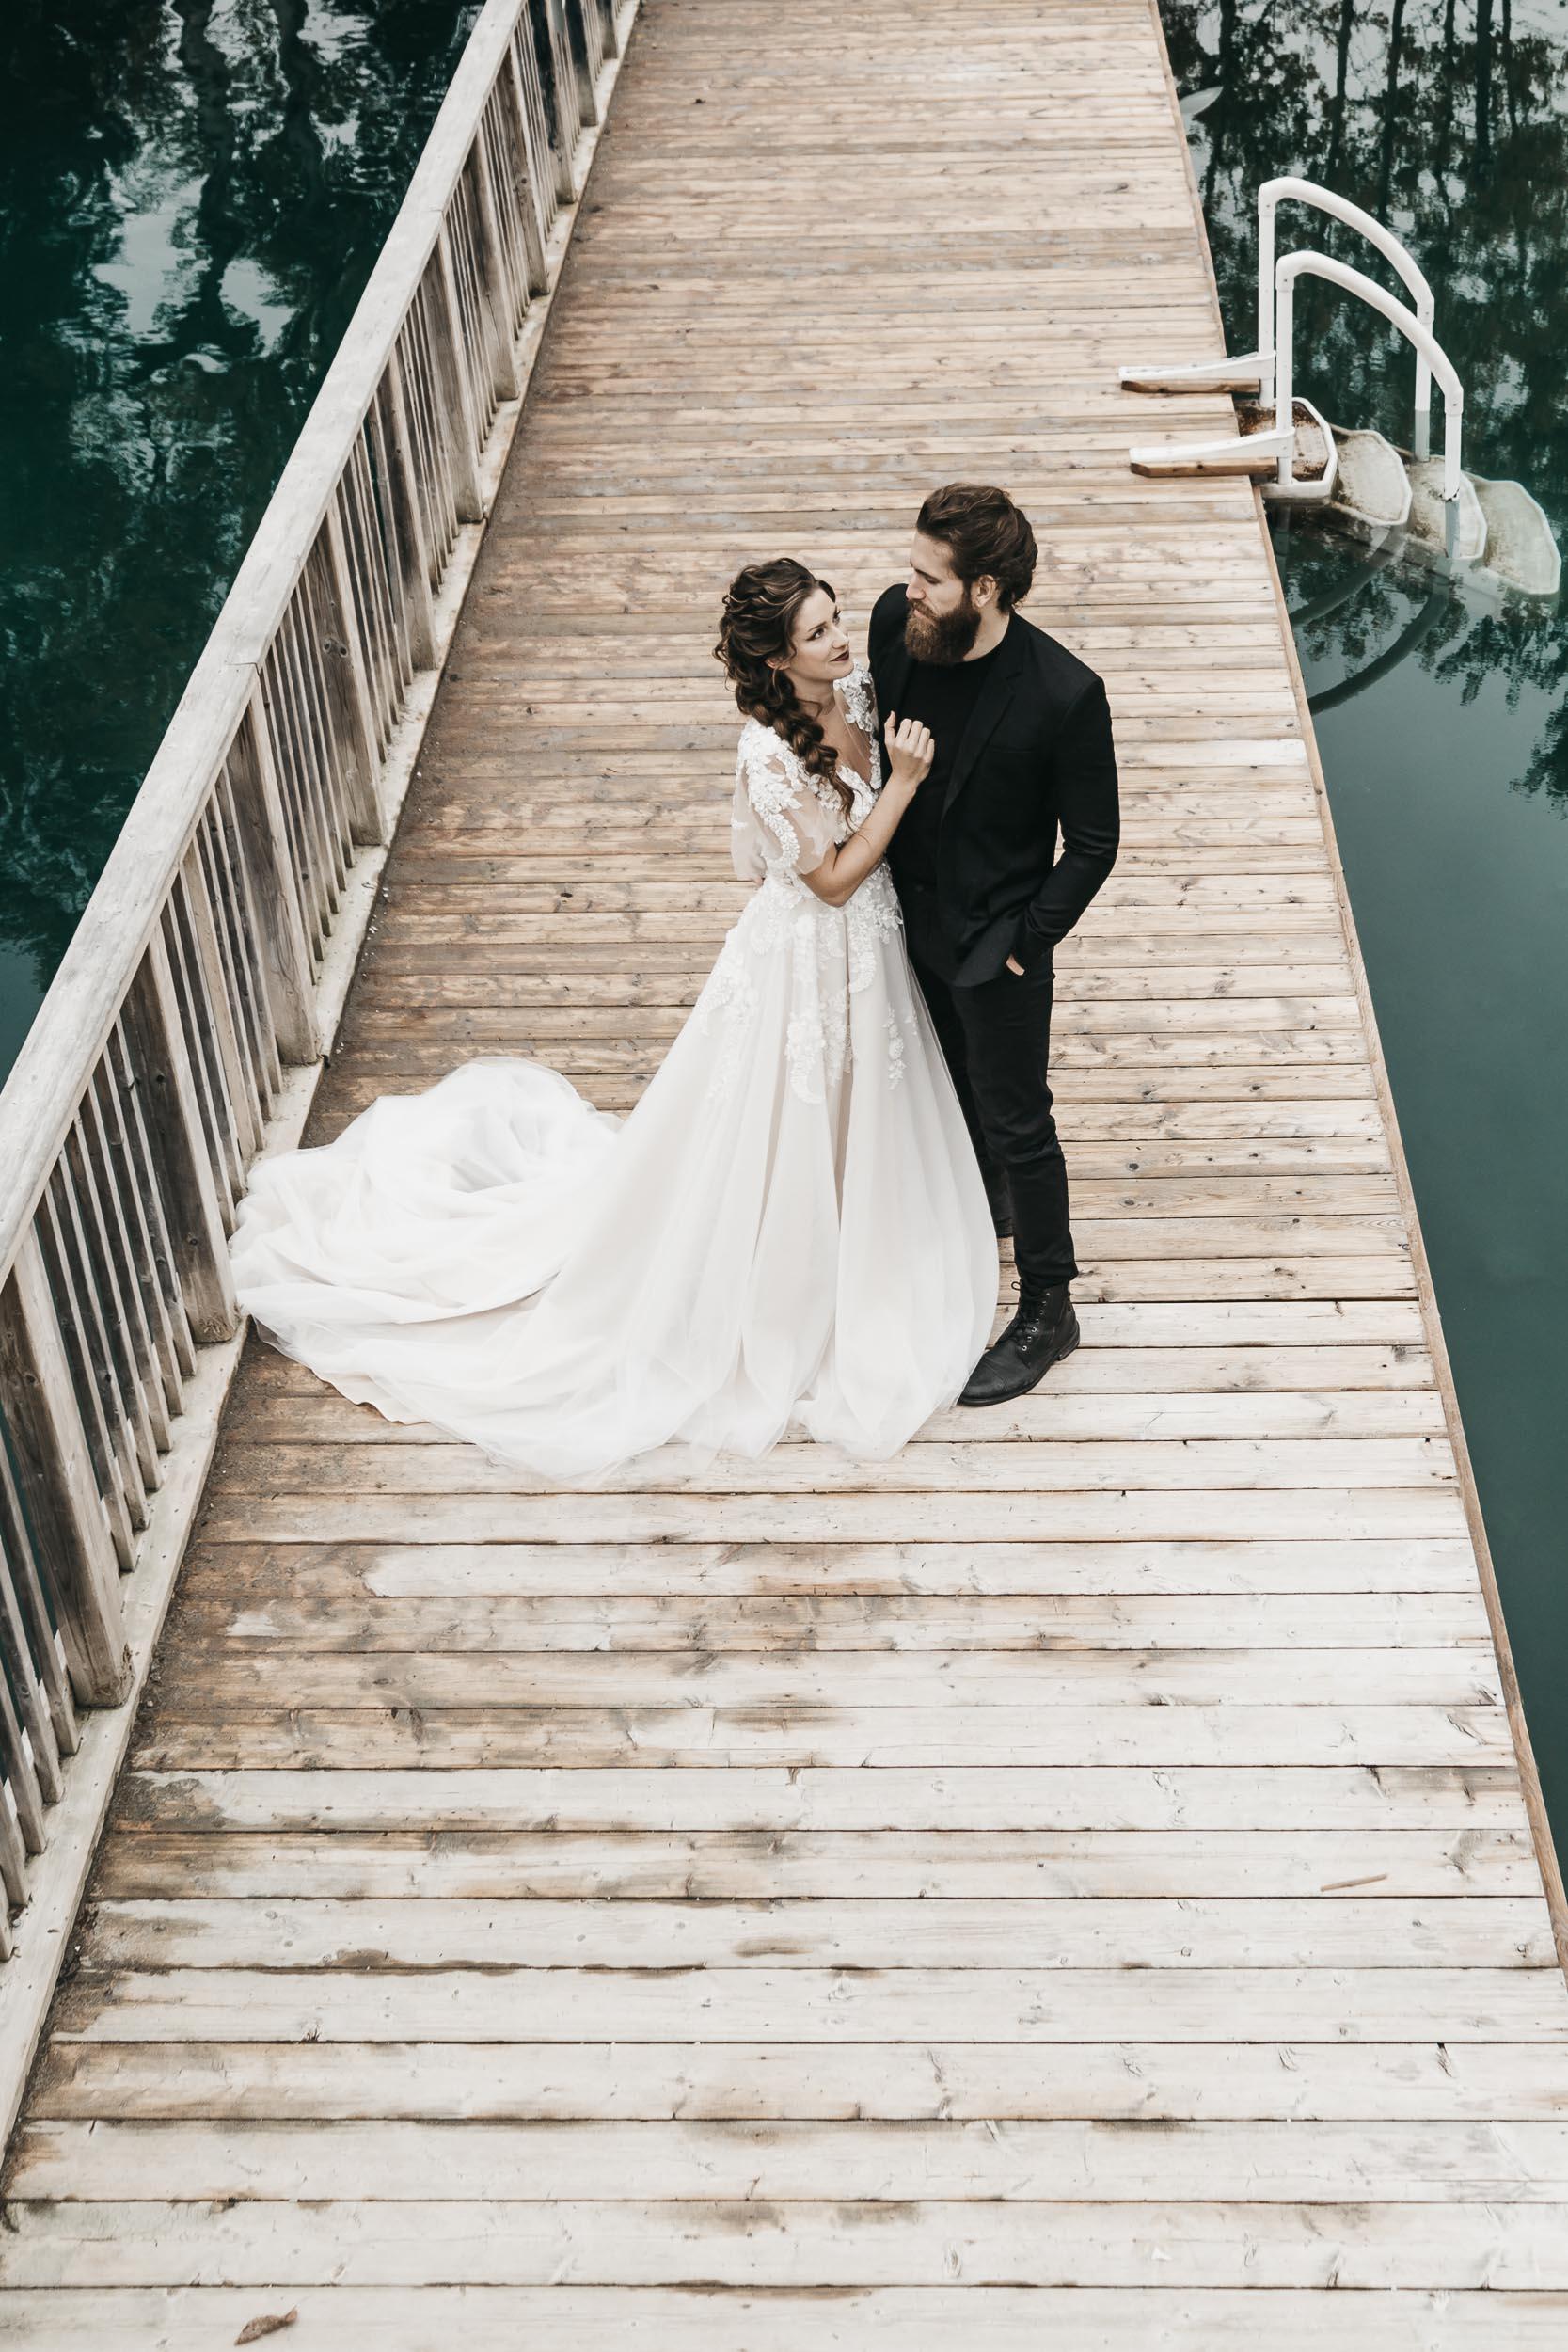 intimate-wedding-elopement-photographer-ottawa-toronto-0003.jpg